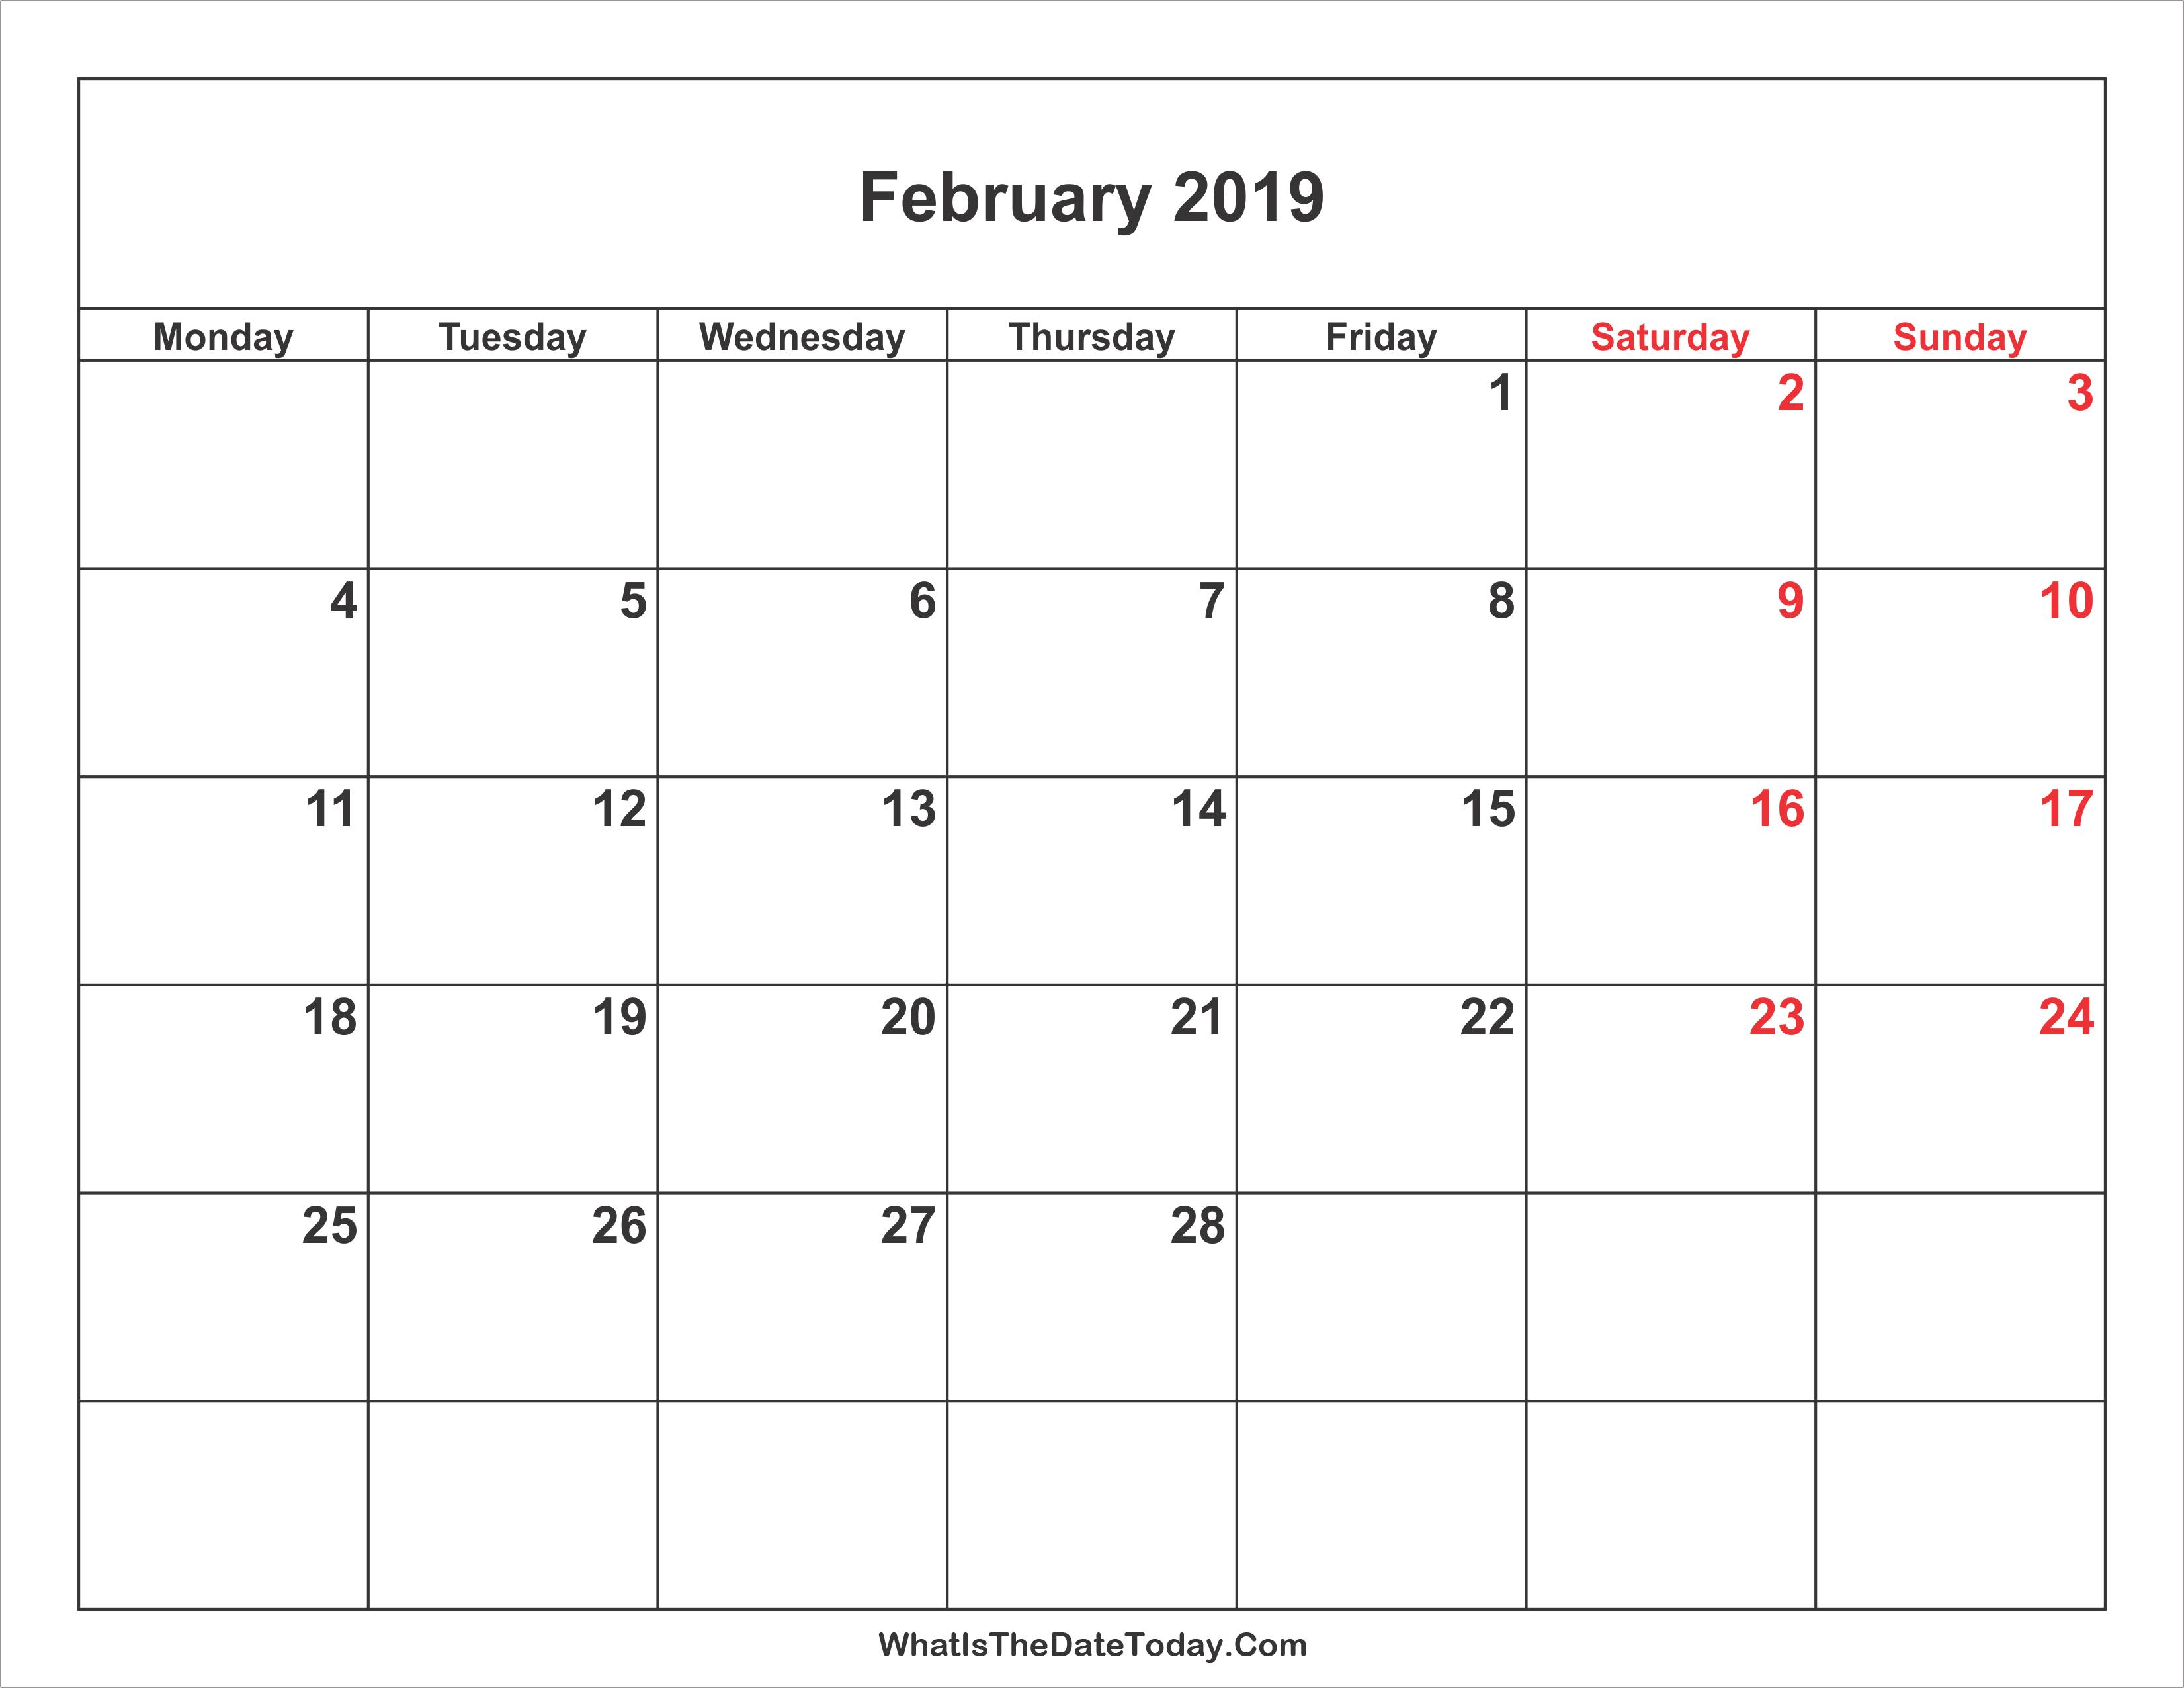 Weekend in February 2019 36